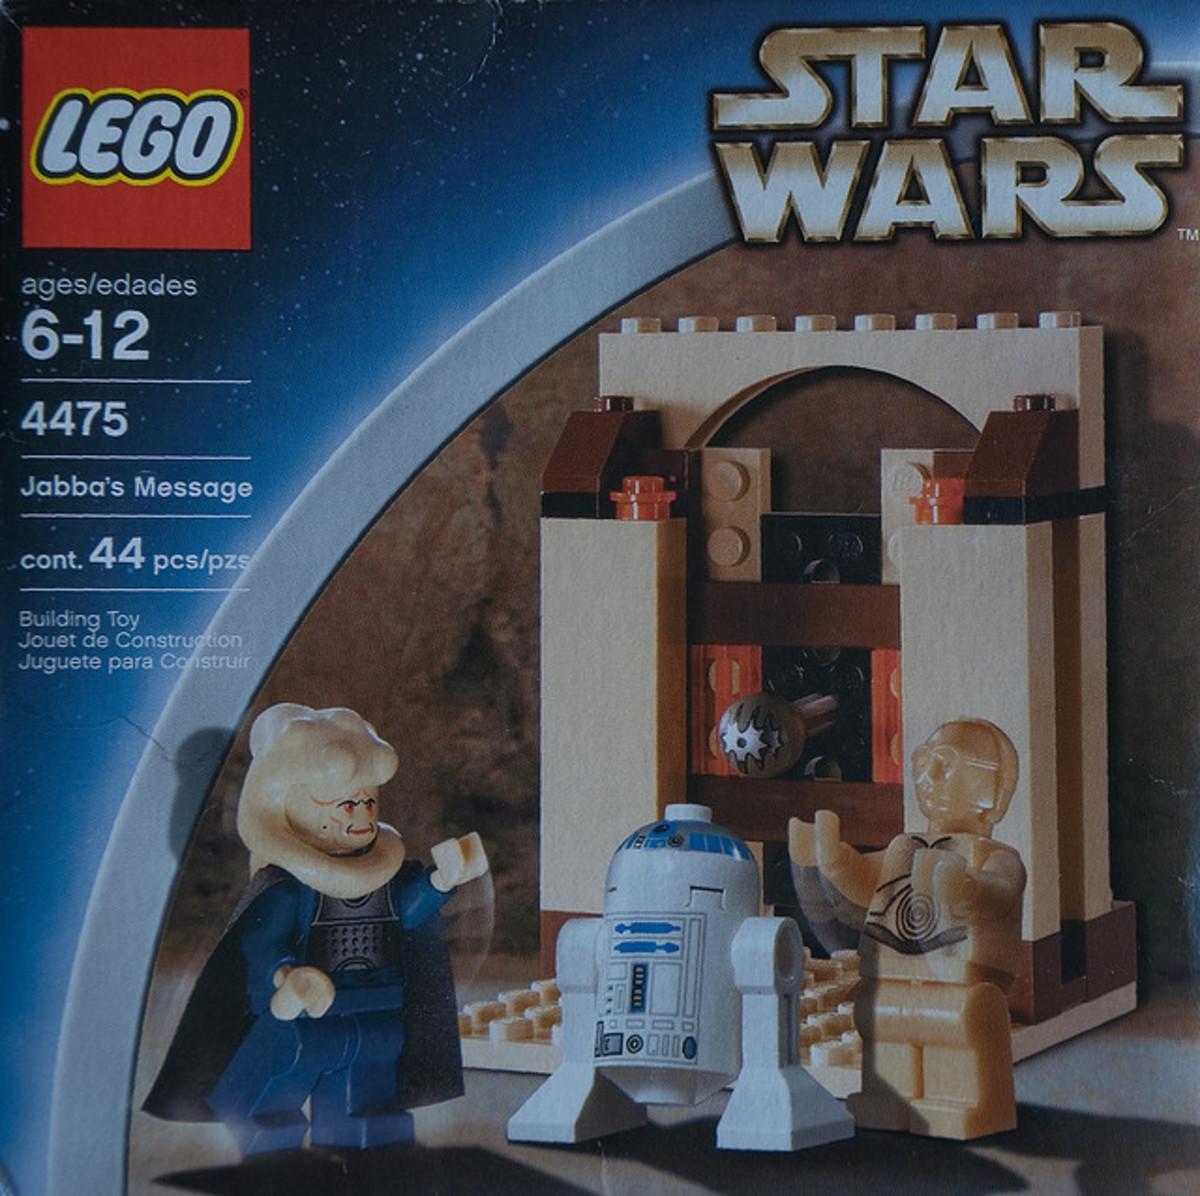 LEGO Star Wars Jabba's Message 4475 Box